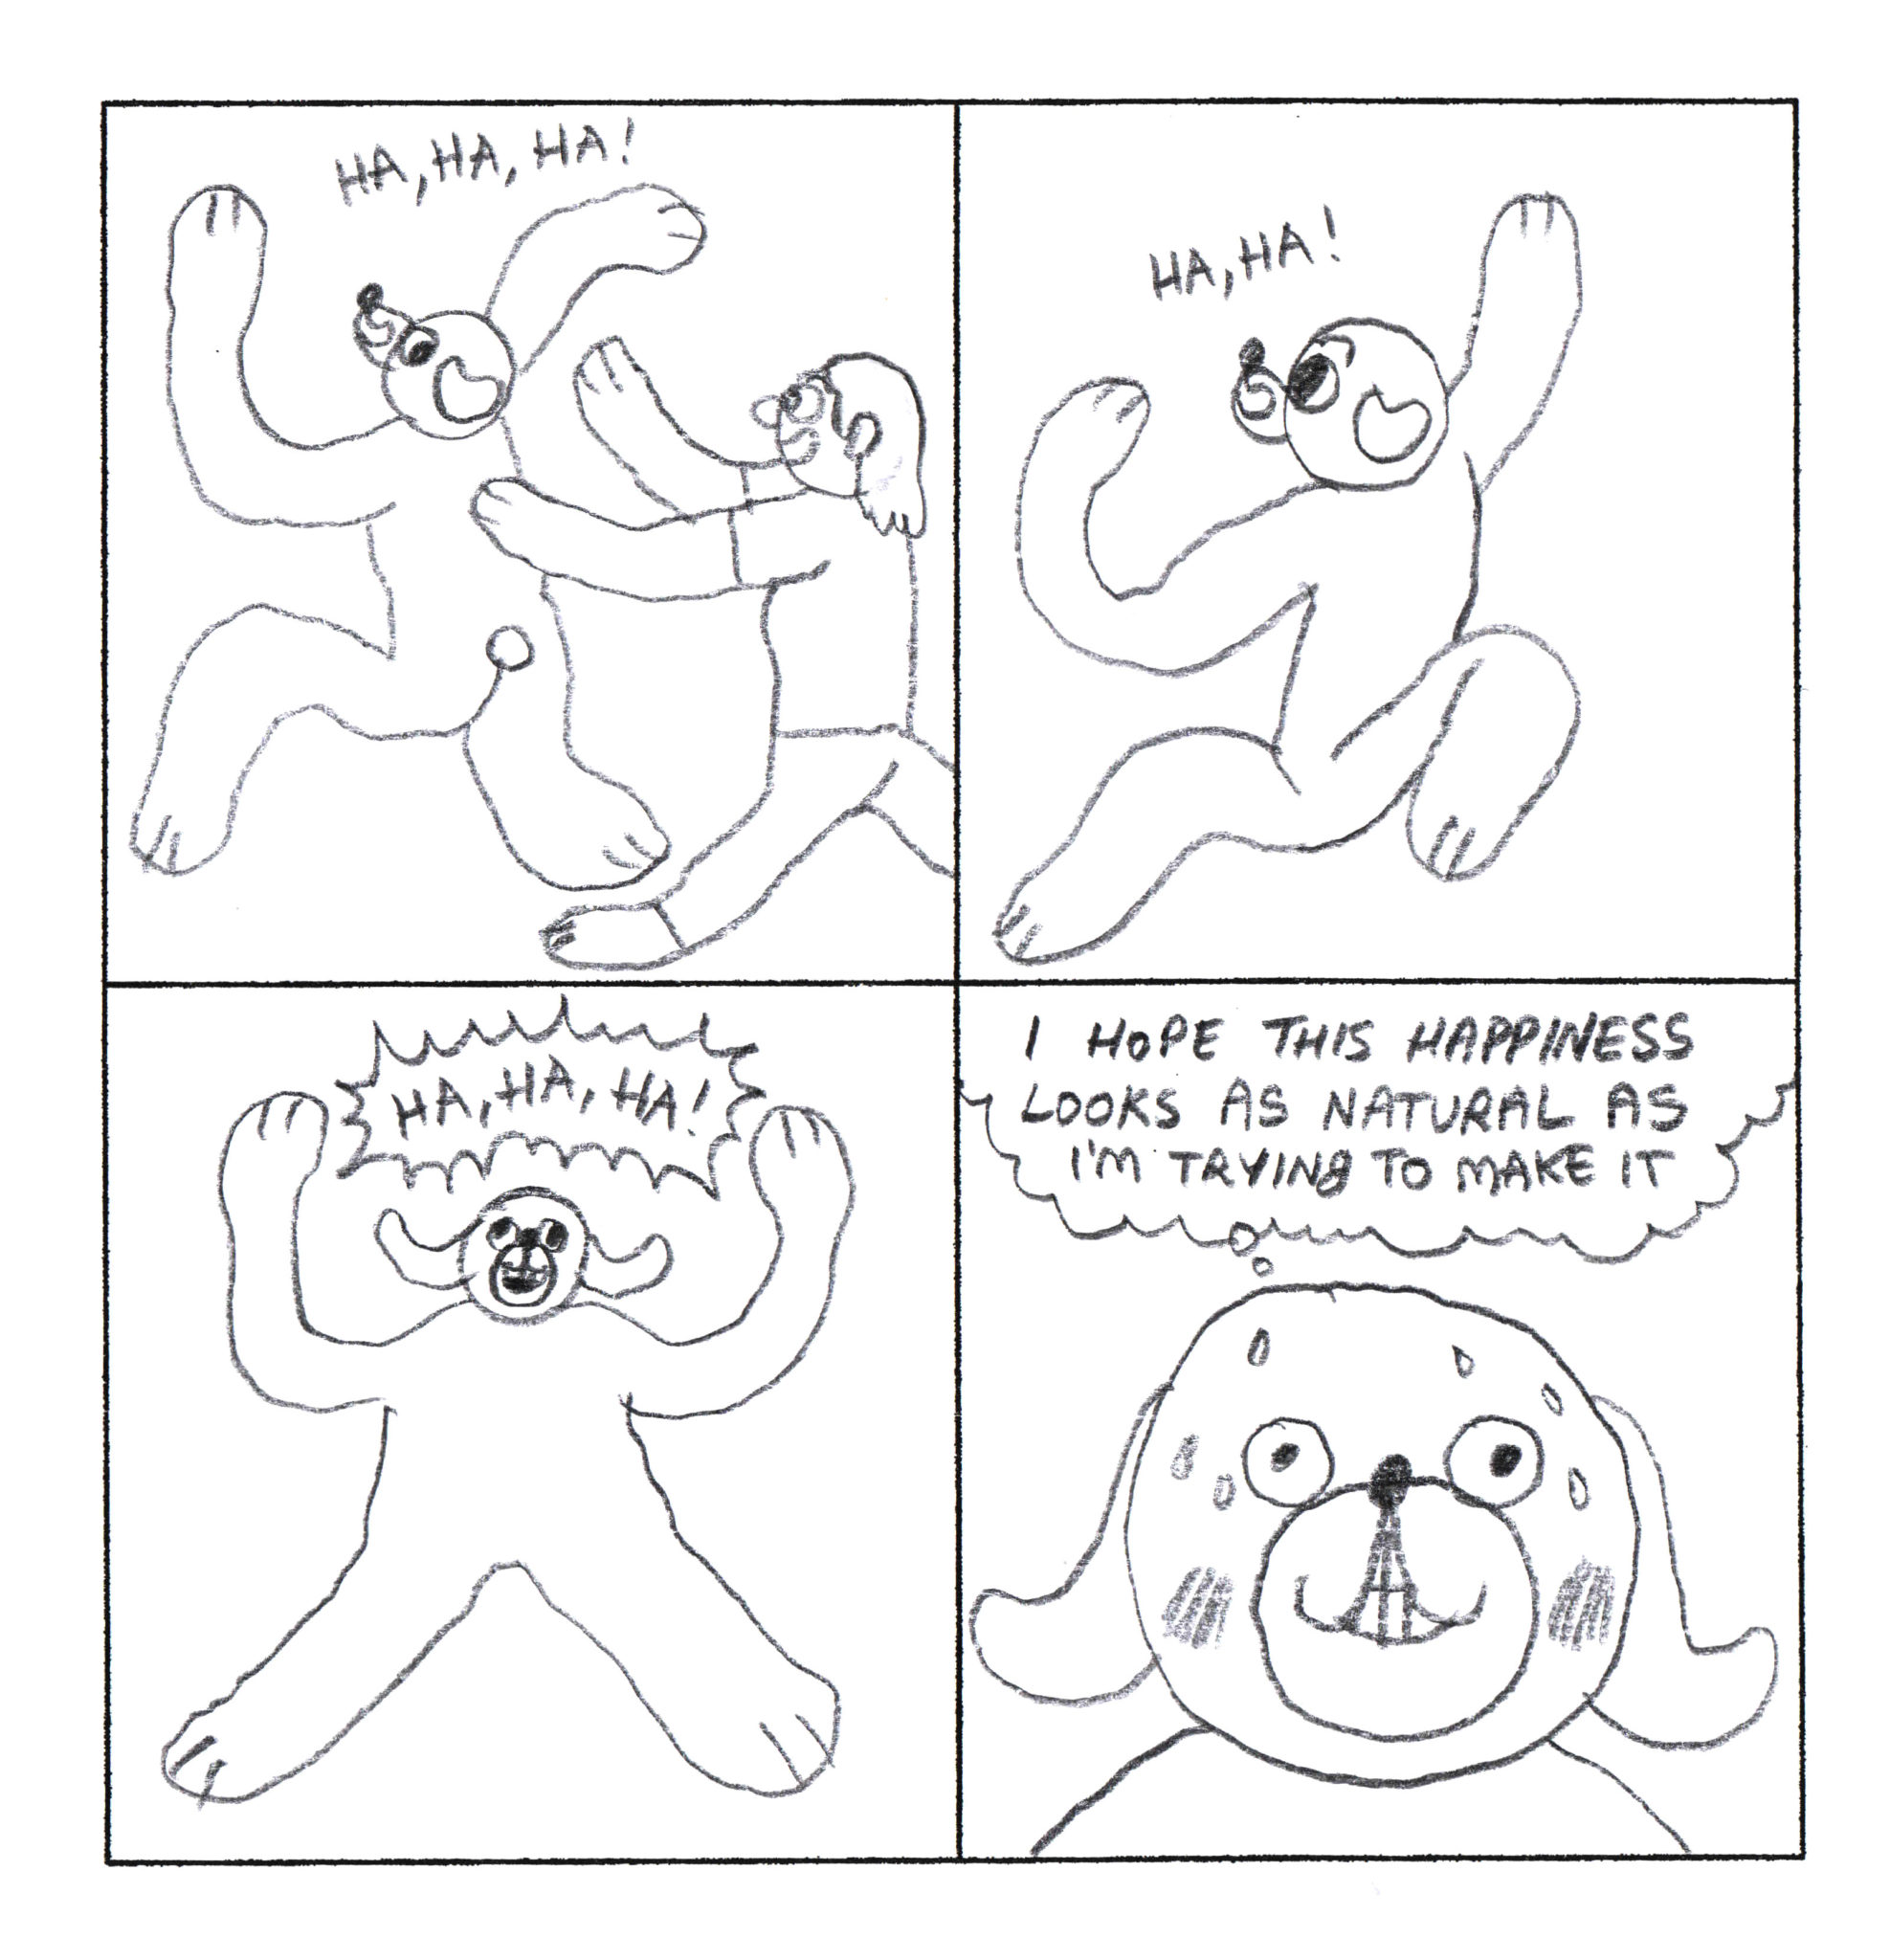 Dog Comics 91-100 - Page 1